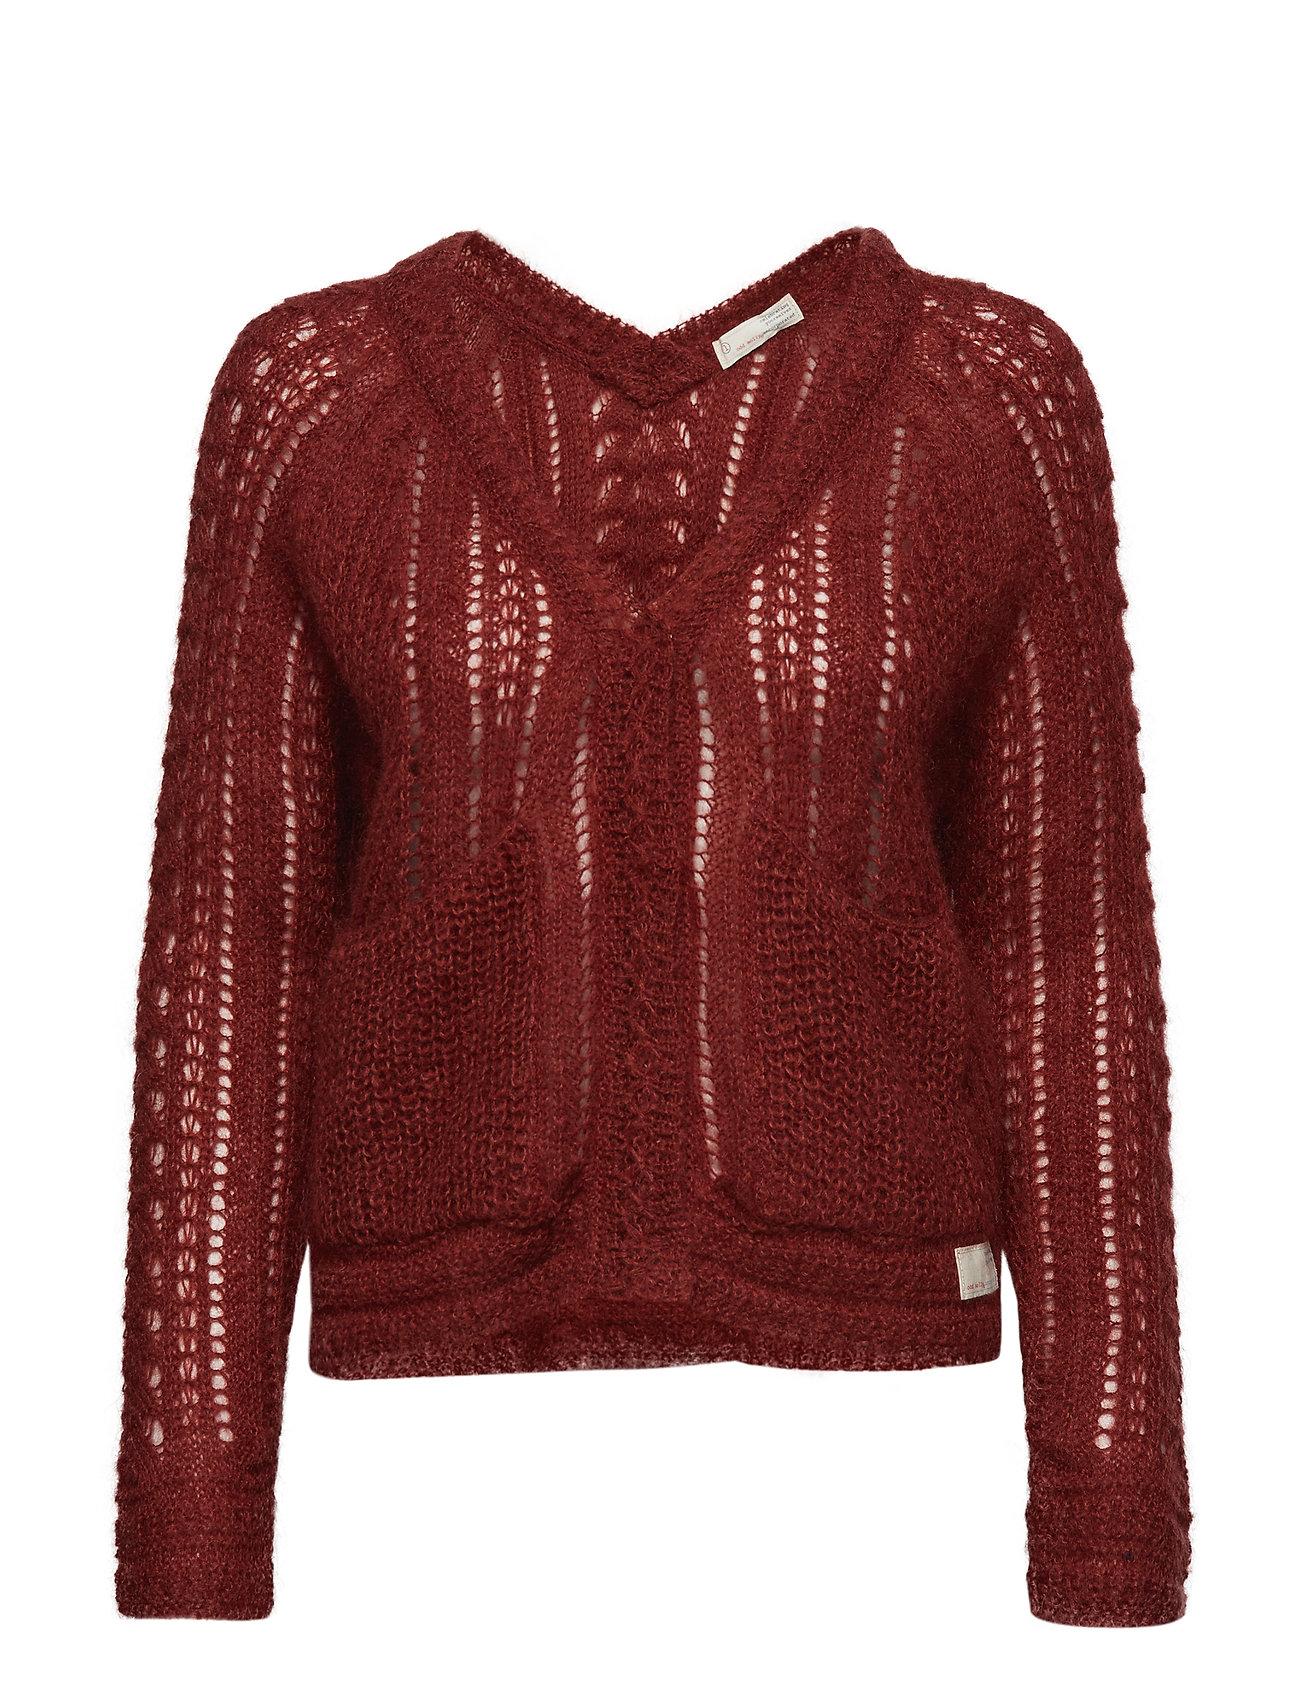 It Sweaterred Sweaterred Molly Feel Feel OchreOdd OchreOdd It Molly Feel K13cJuF5Tl